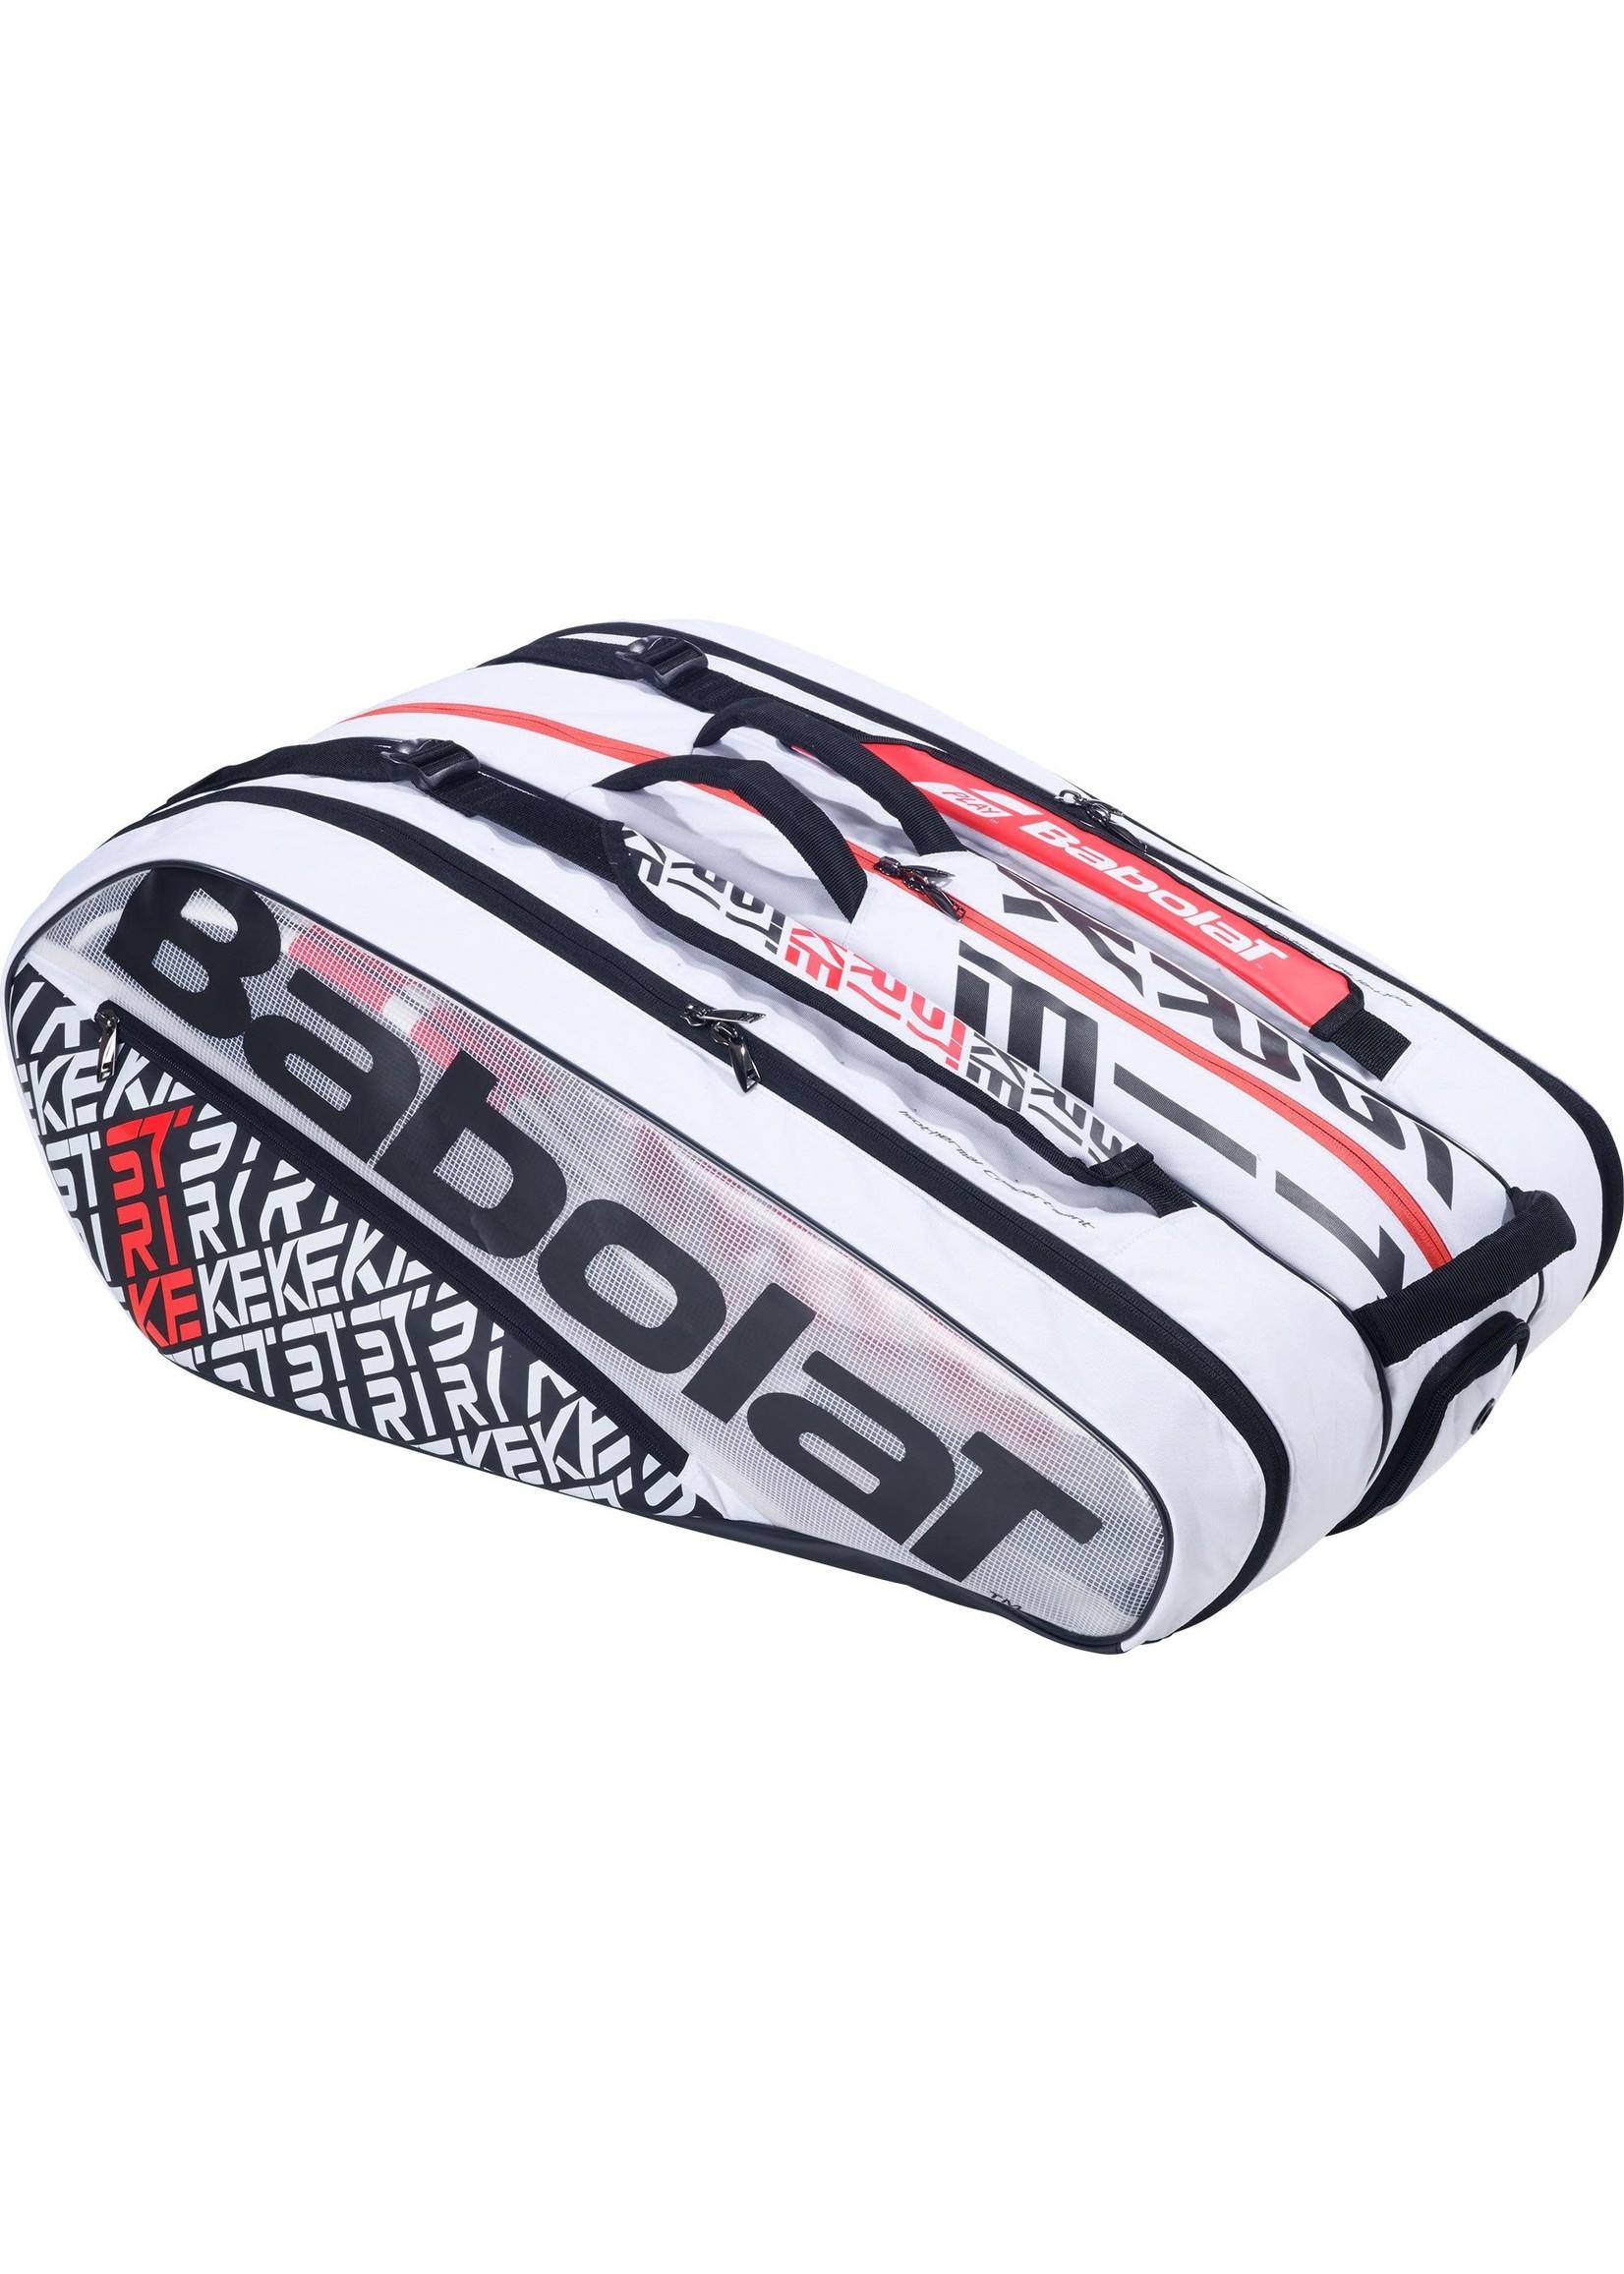 Babolat Babolat Pure Strike 12 Racket Bag, White/Red (2019)